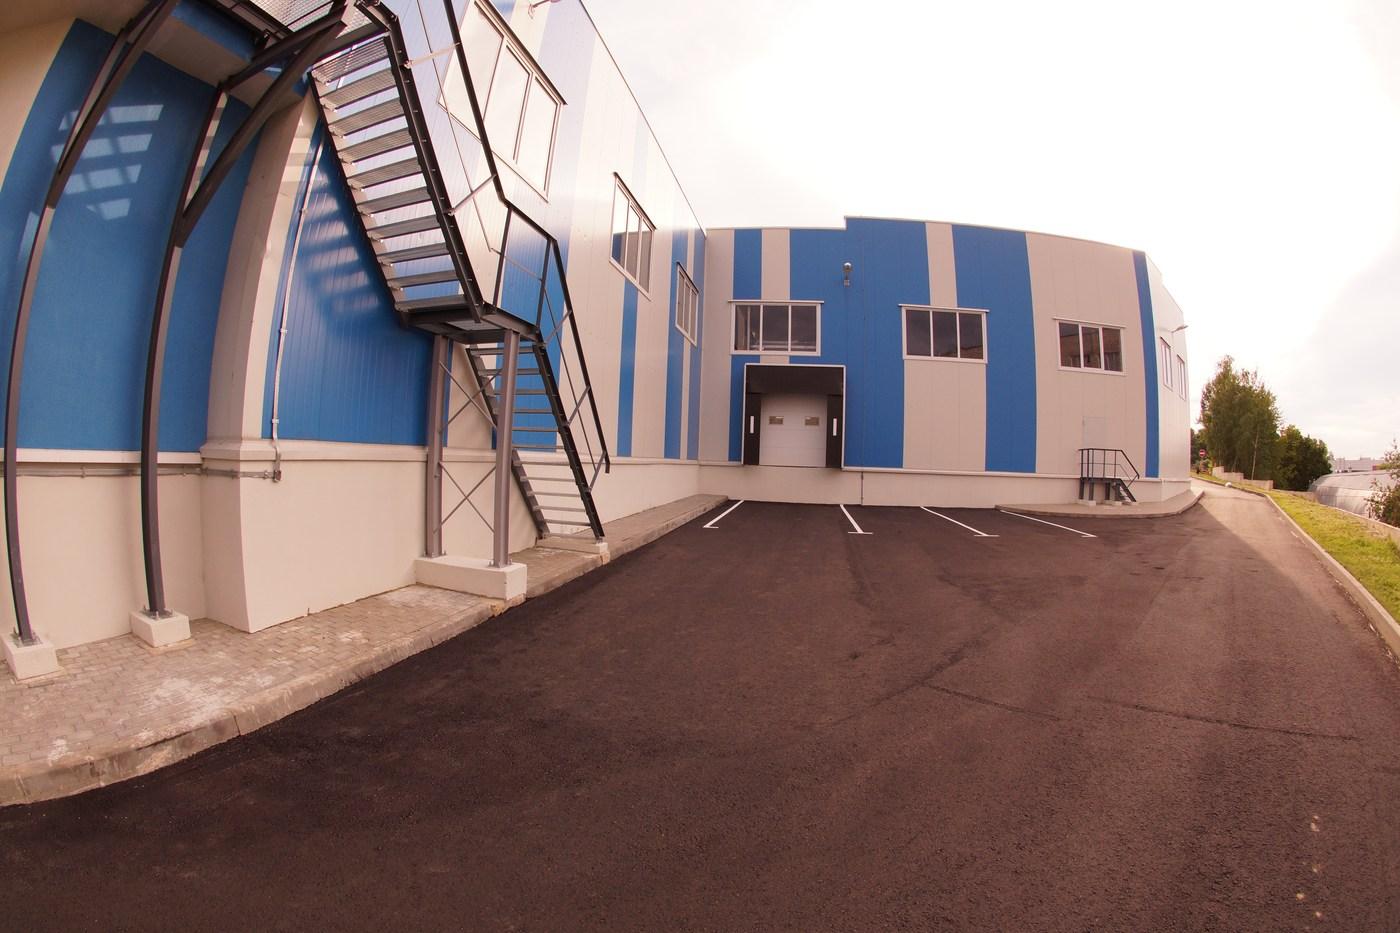 Погрузочно-разгрузочная площадка складского корпуса Пластик Текнолоджиз